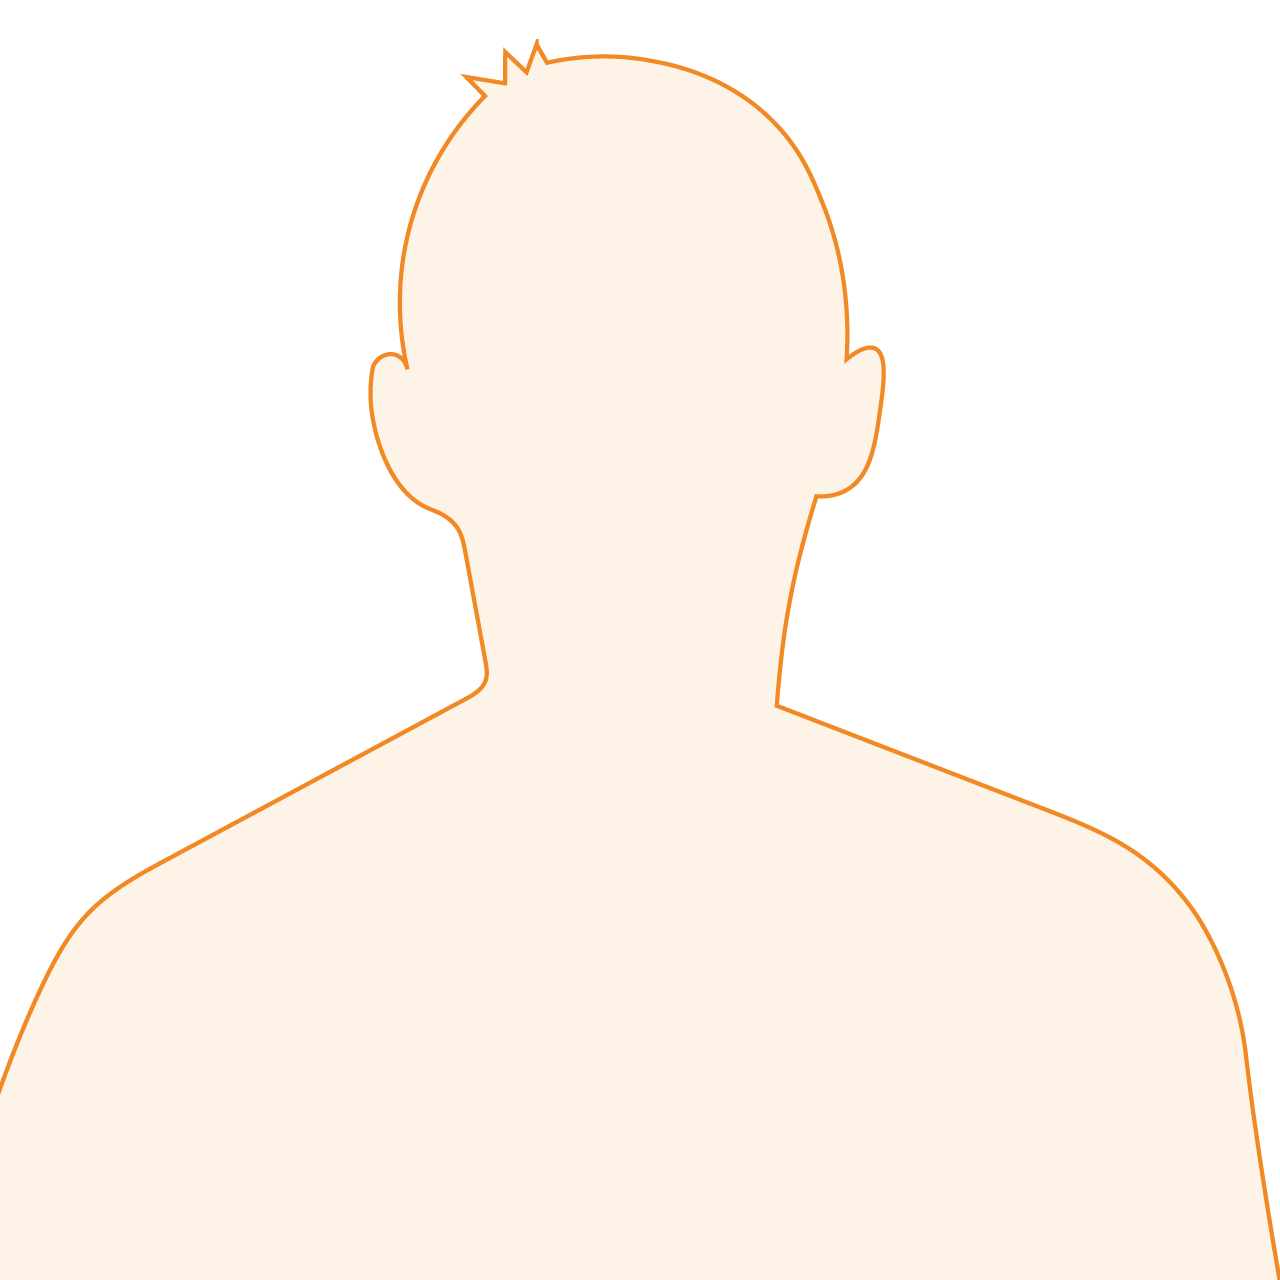 Profilbild Marc Weber Betroffenenberatung